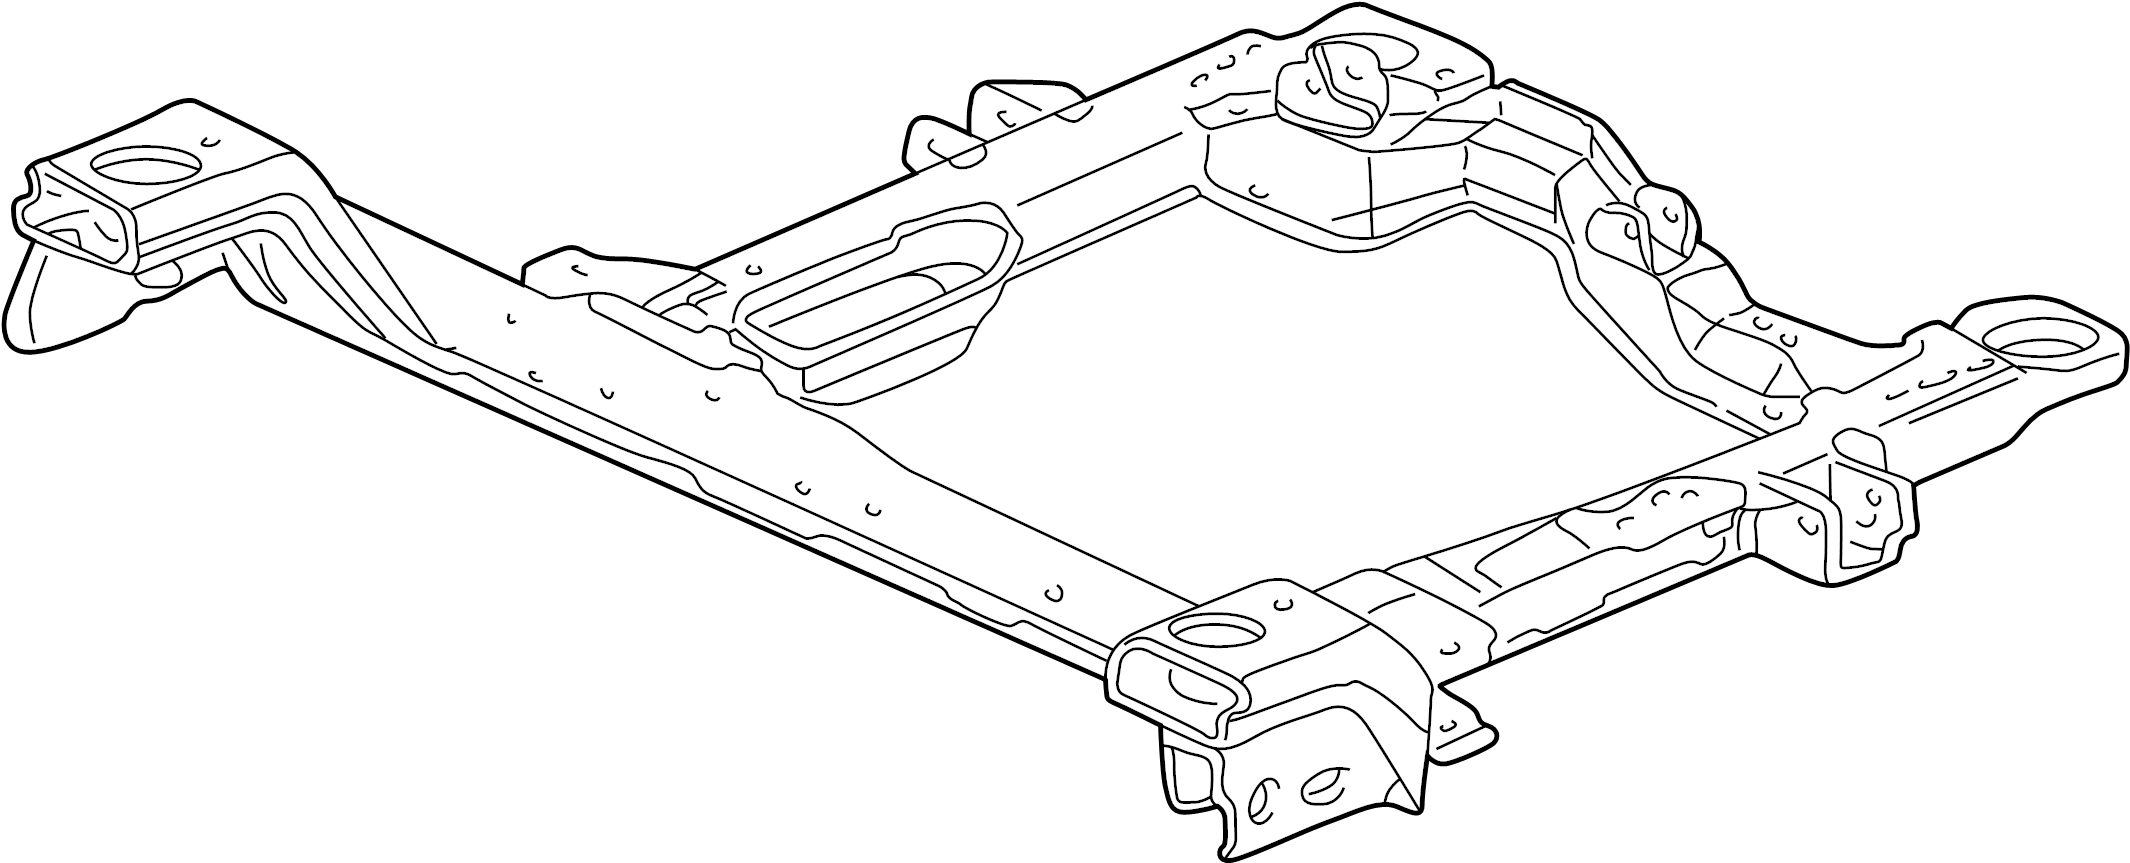 Buick Century Engine Cradle Front Suspension